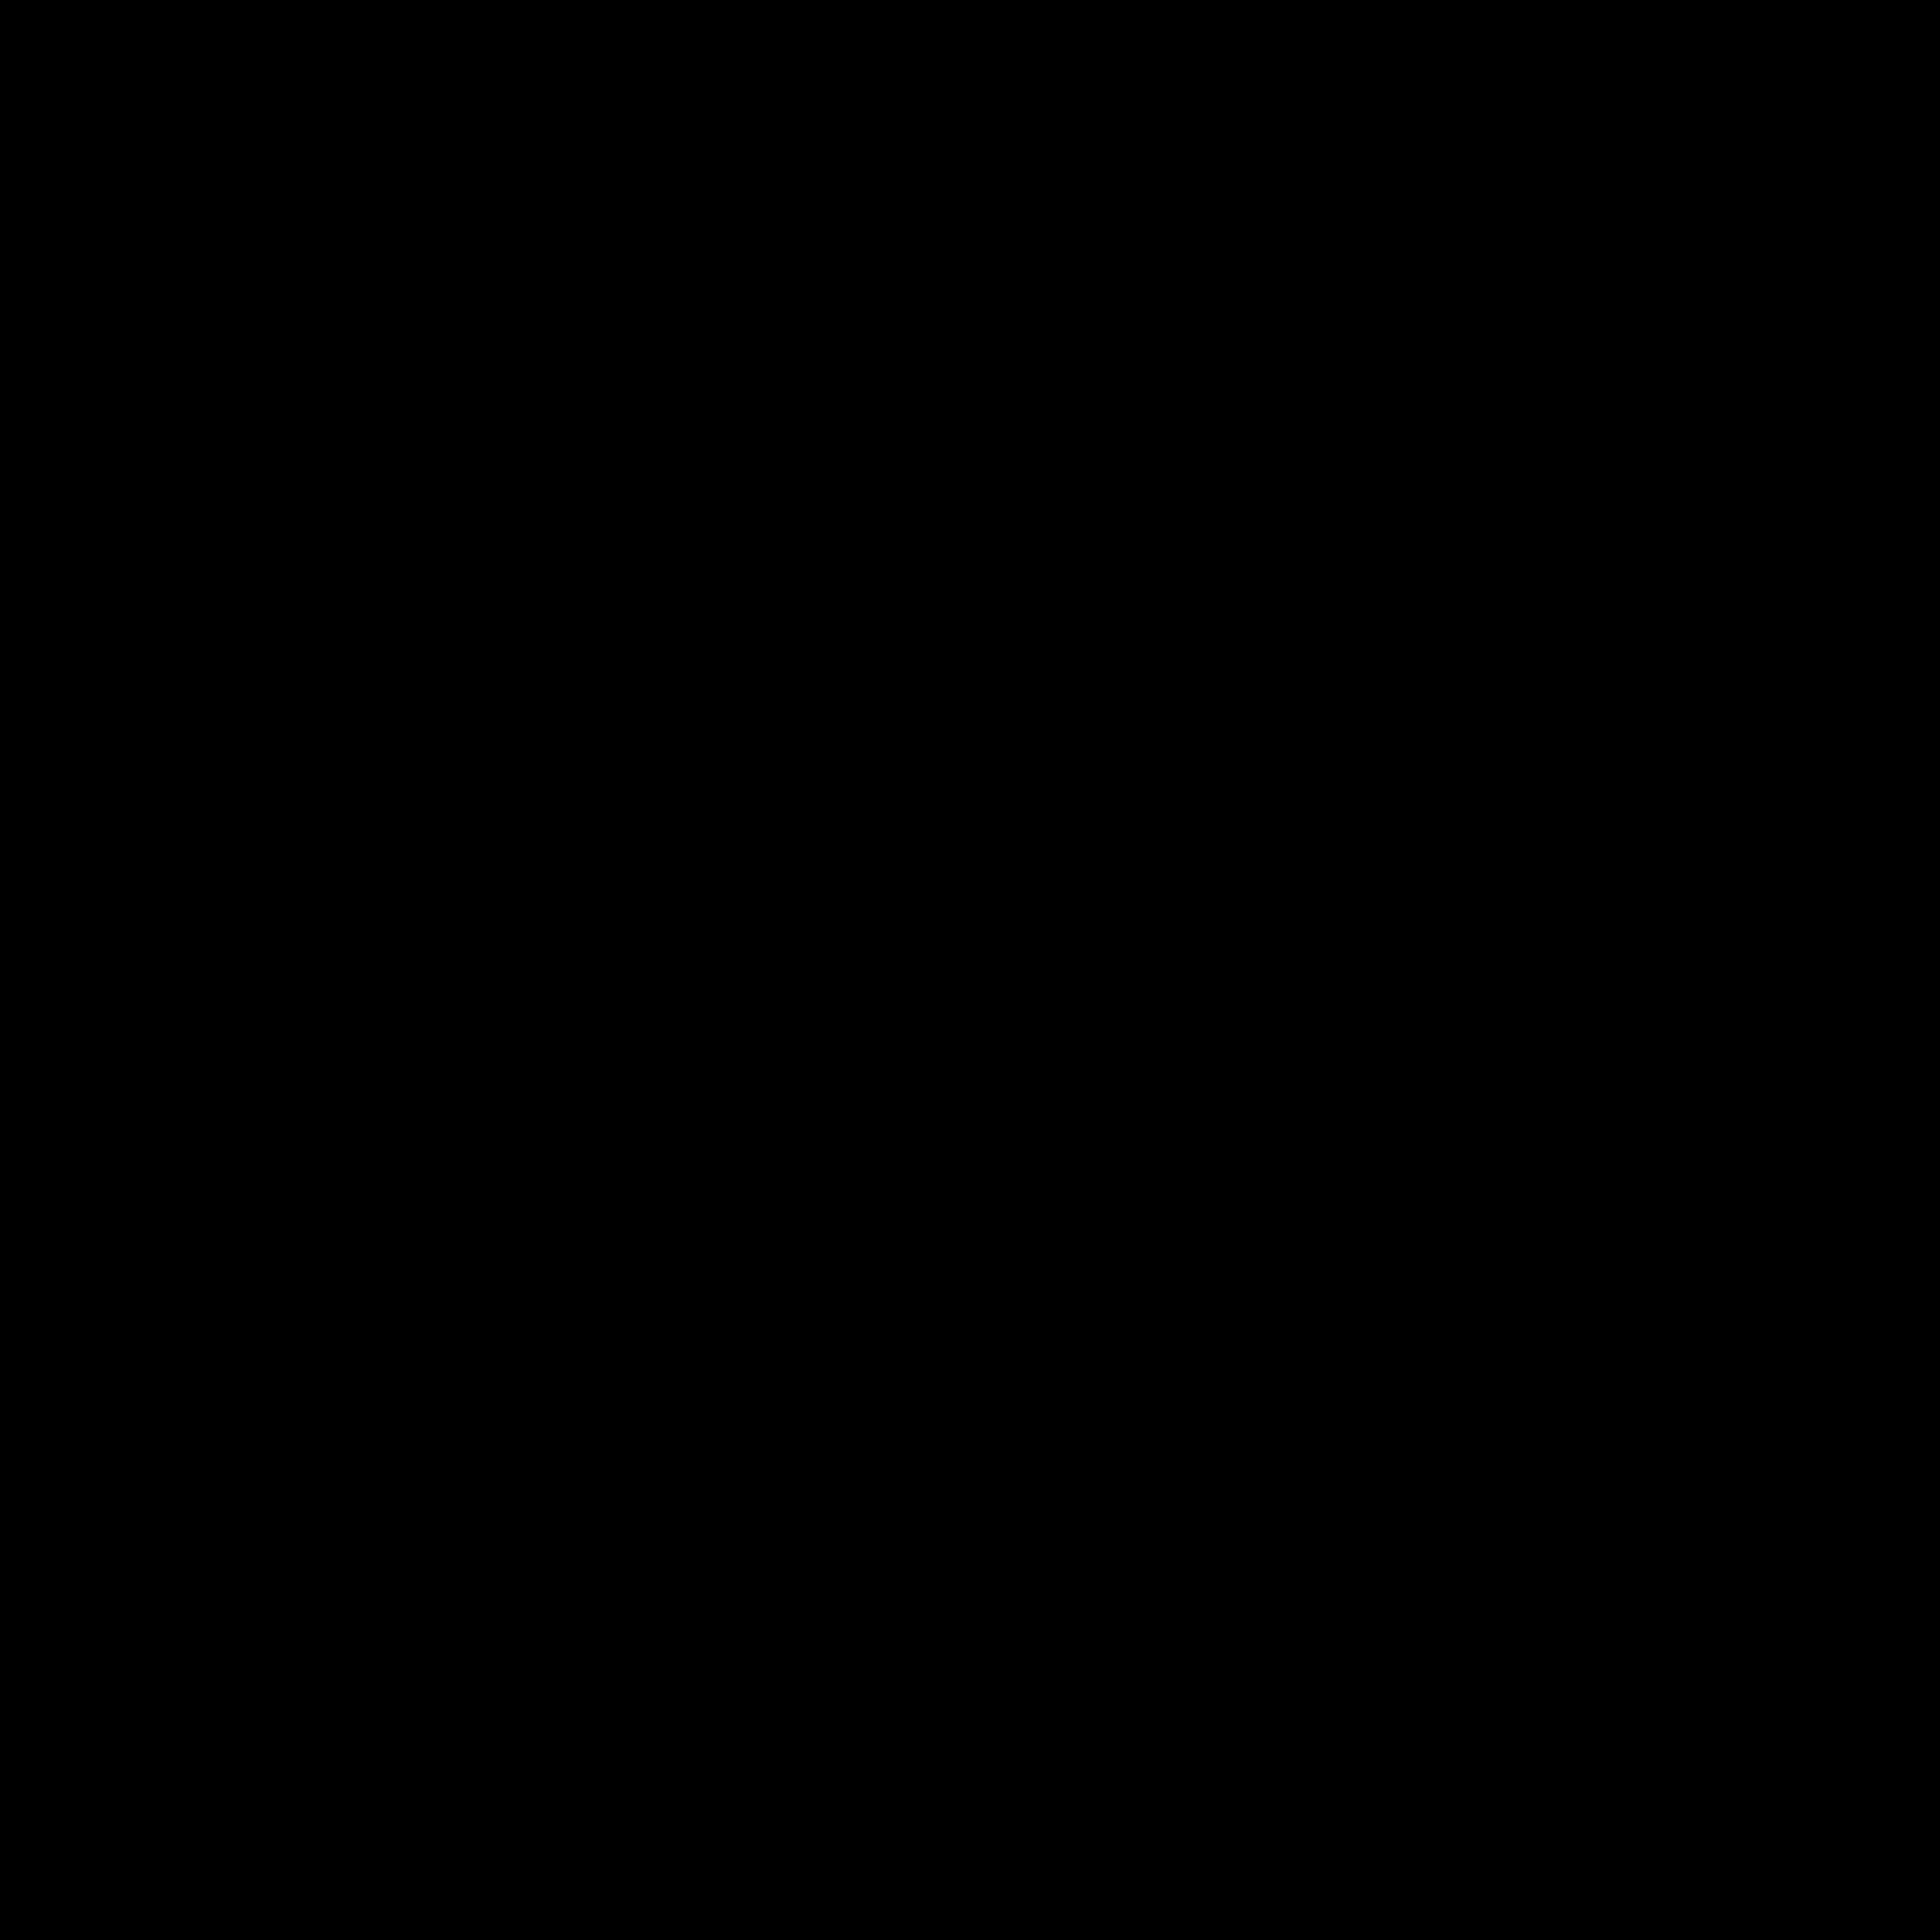 Clipart jewish star image black and white download Clipart - Jewish Quilt image black and white download